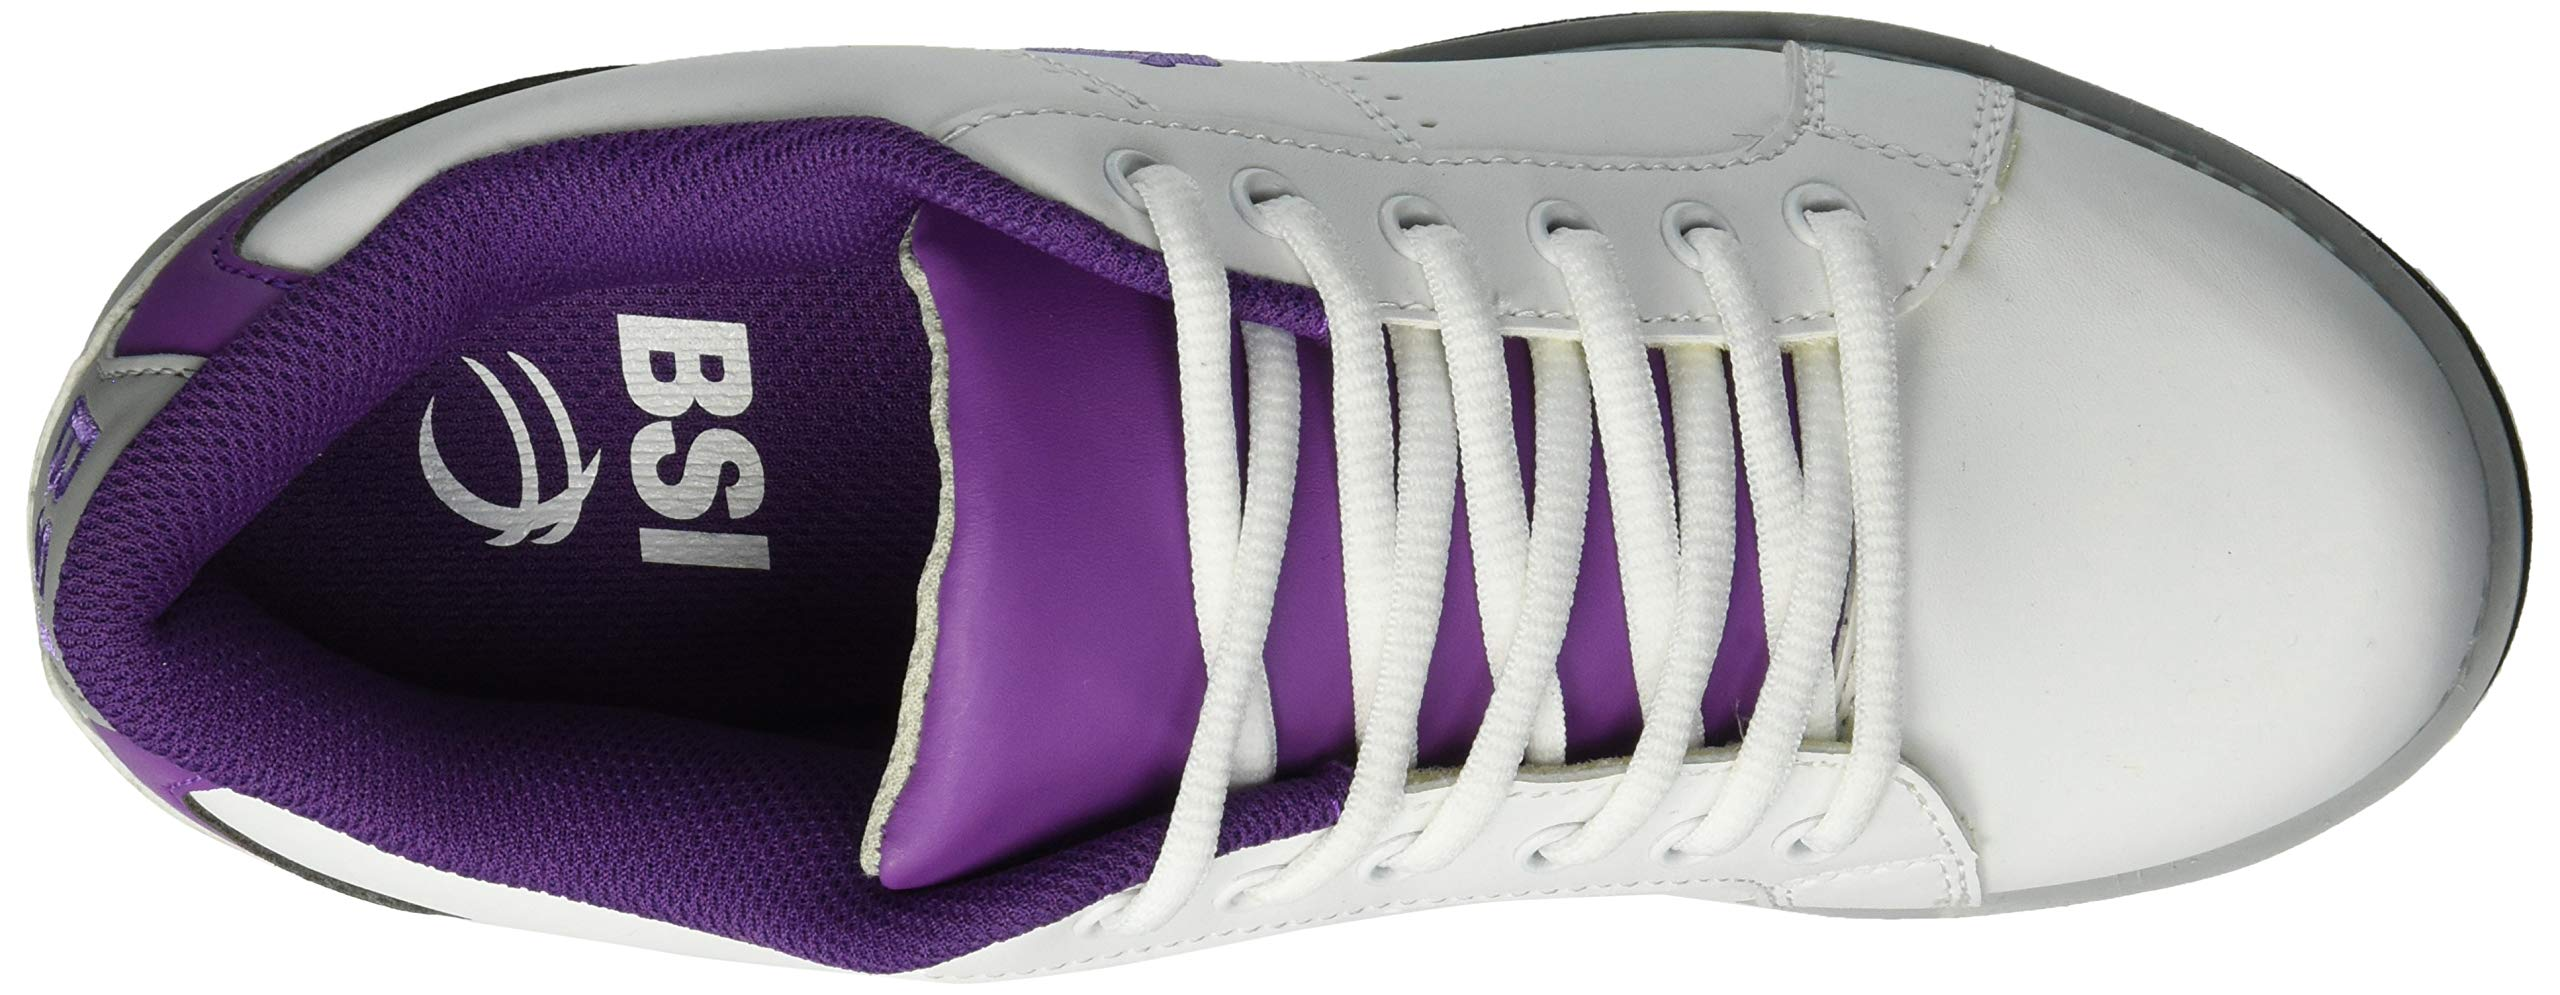 BSI Women's 460 Bowling Shoe, White/Purple, Size 7 by BSI (Image #8)